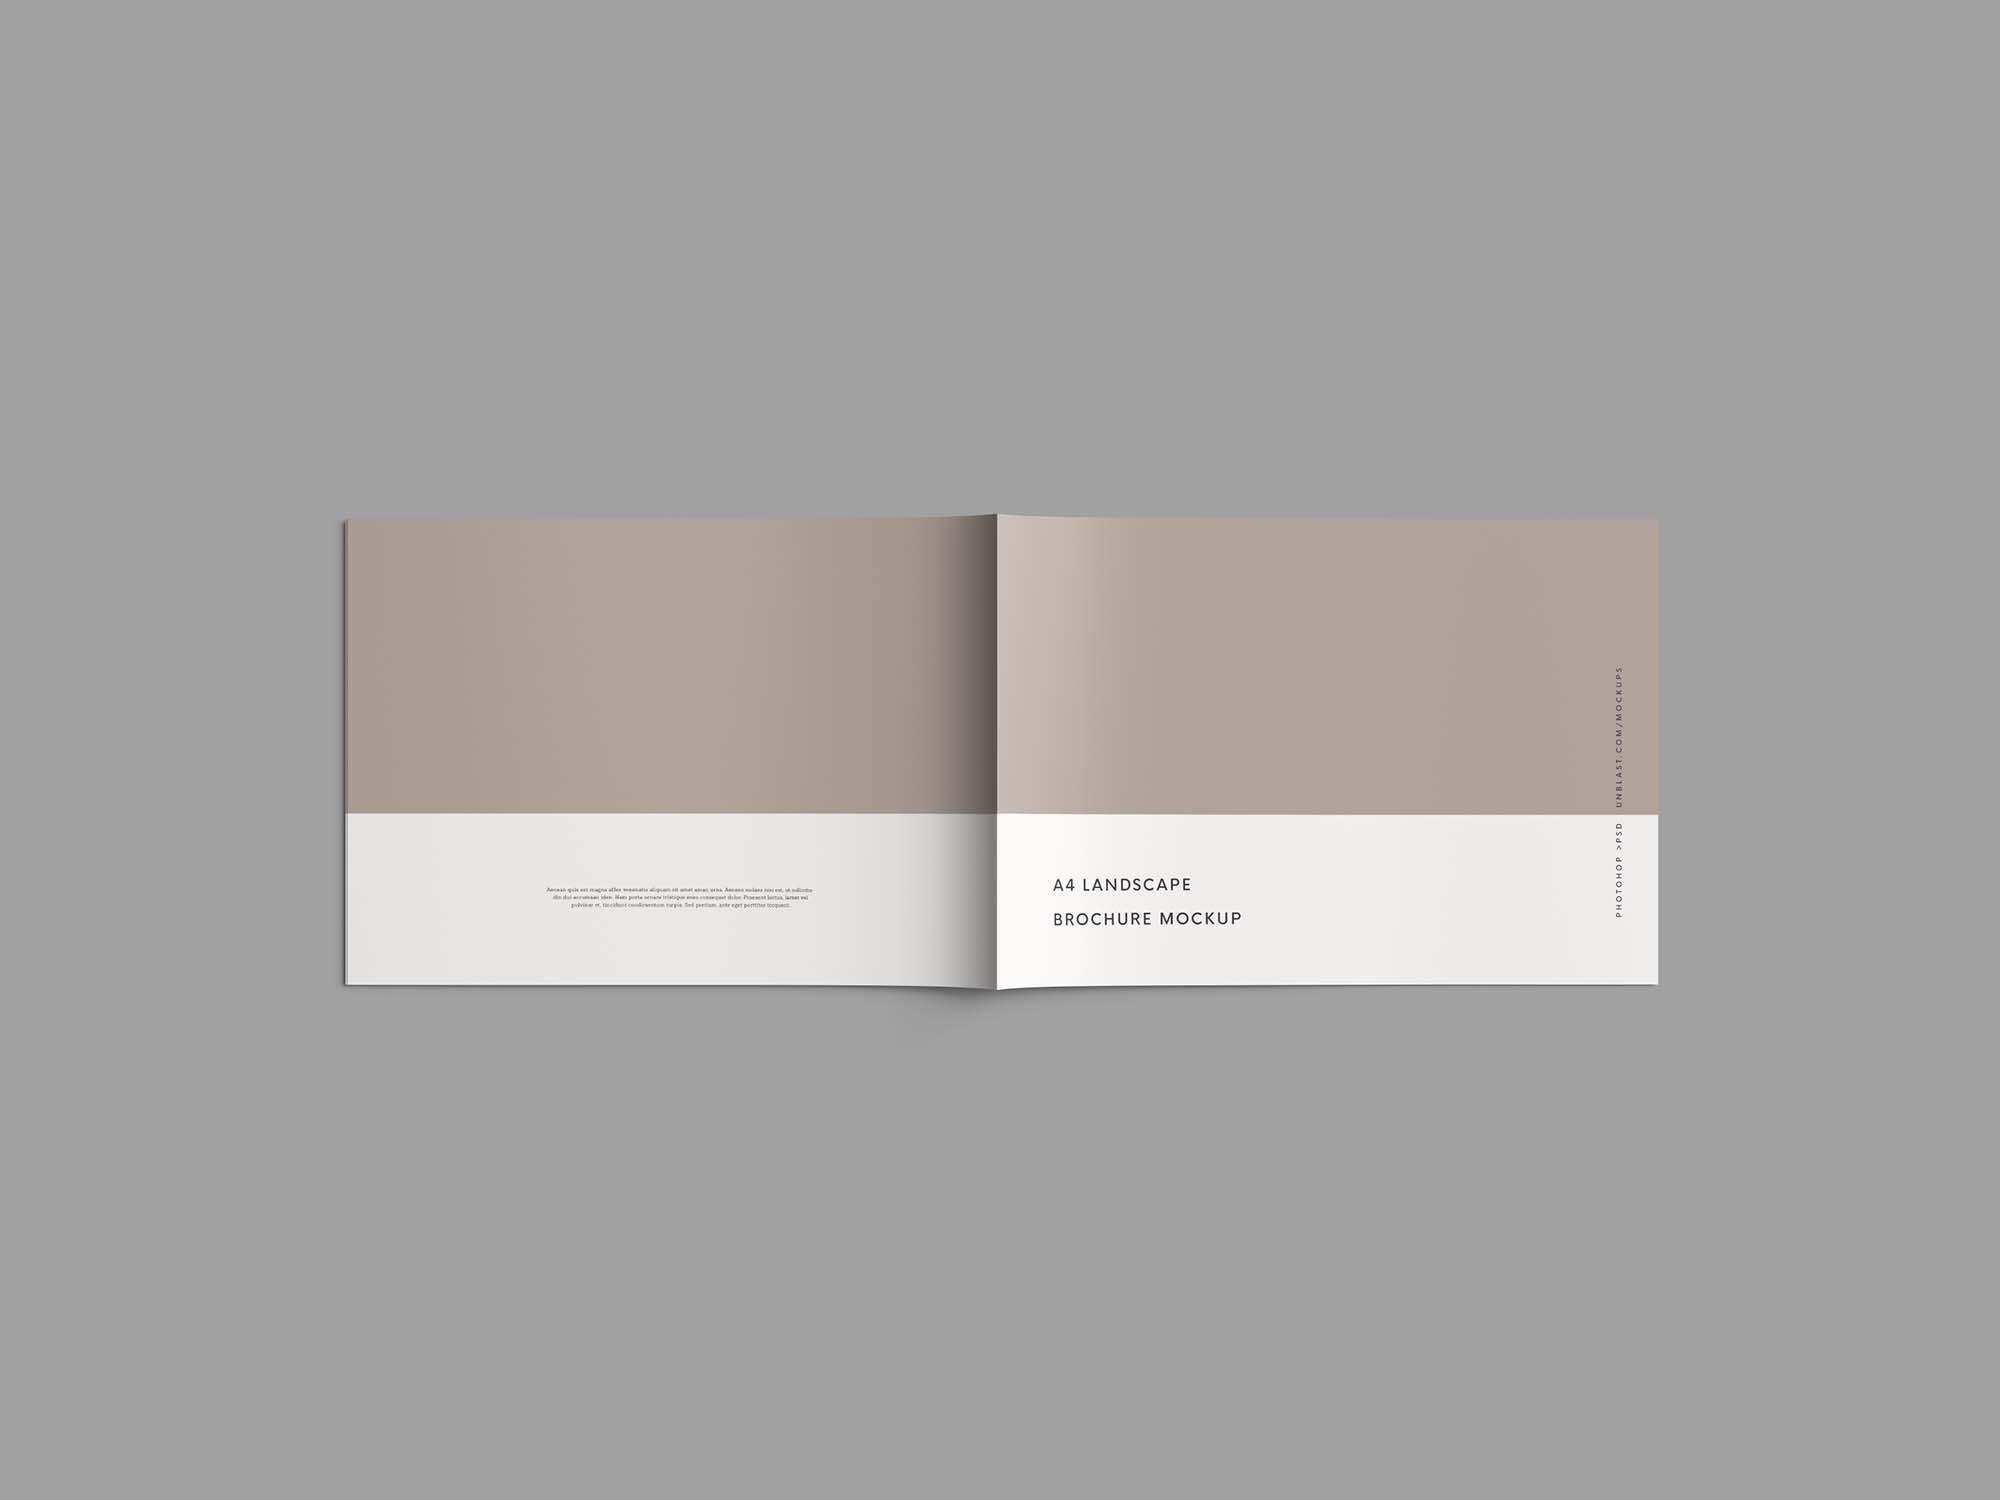 free a4 landscape brochure mockup psd